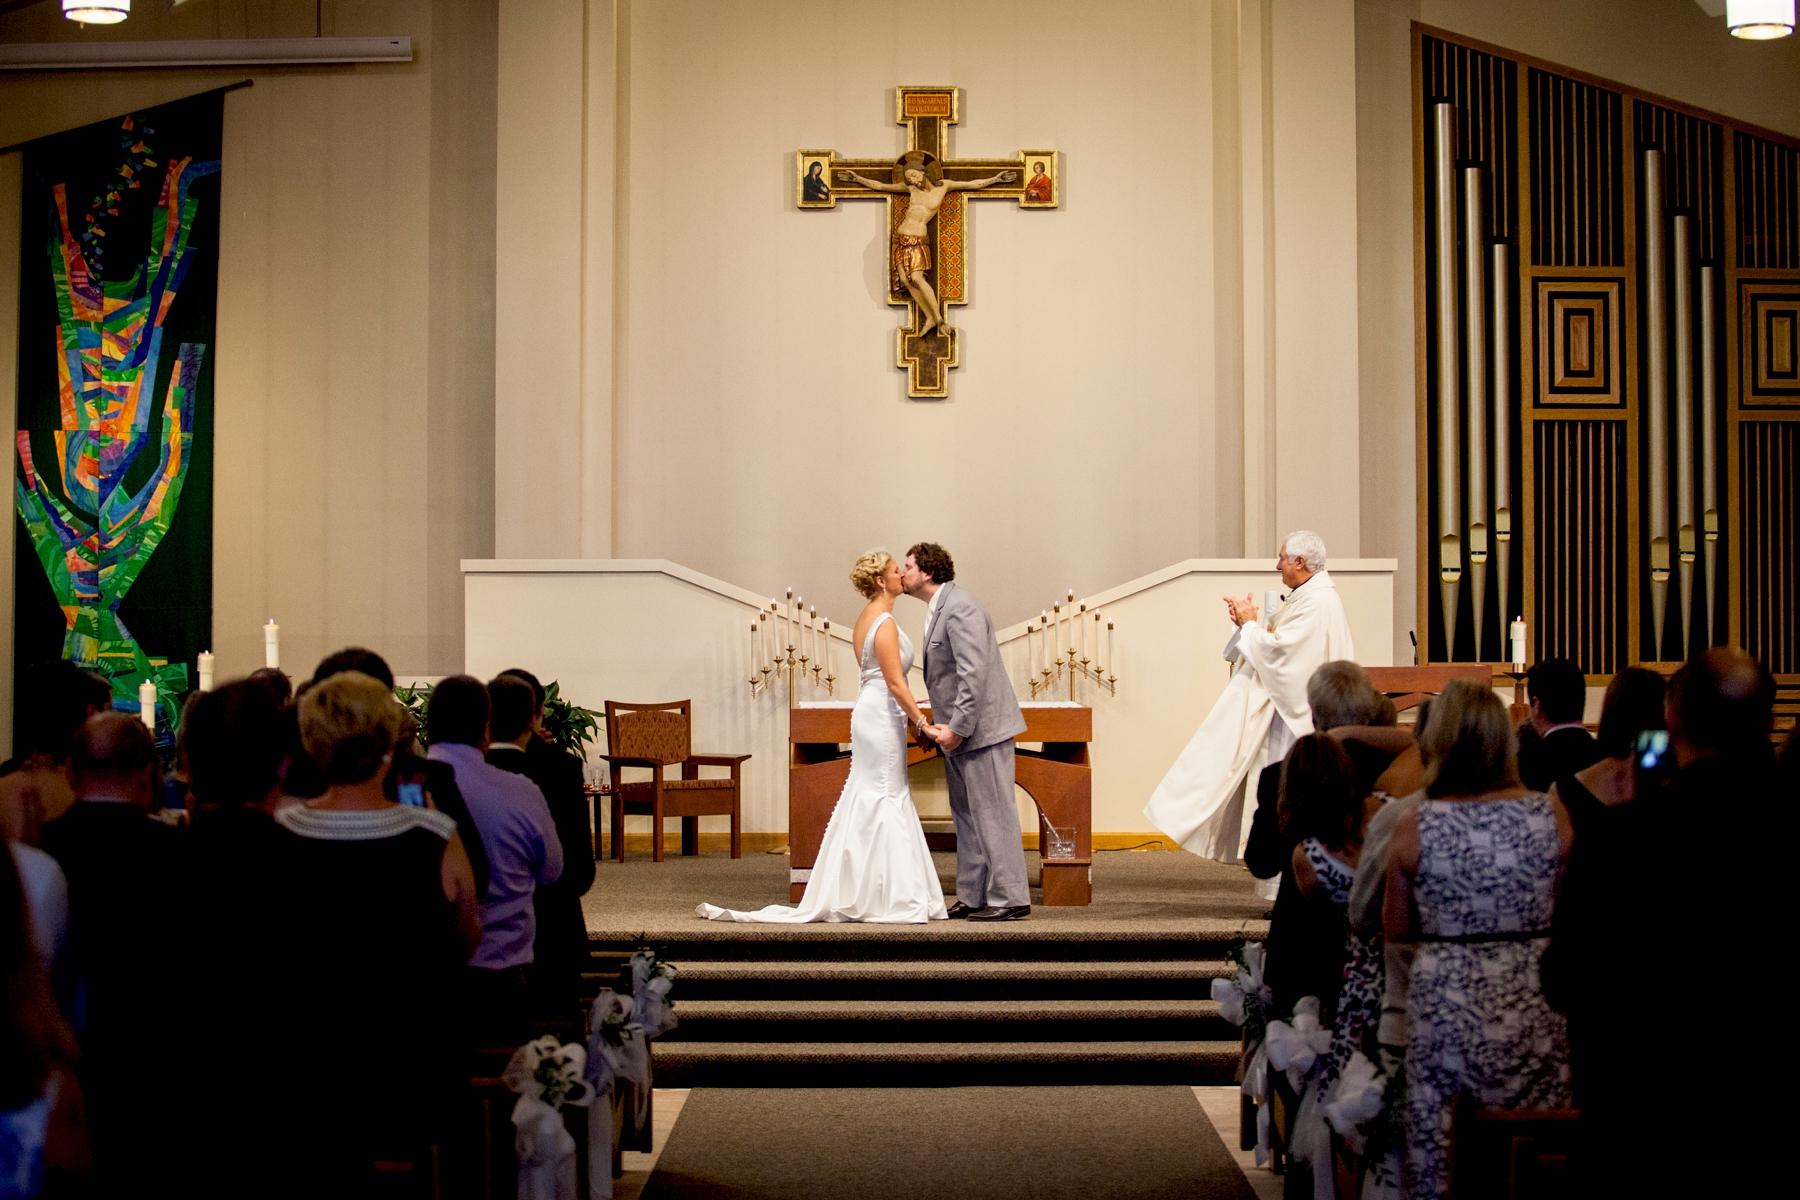 Brandon_Shafer_Photography_Chris_Lauren_Michigan_State_Capital_Wedding_0025.jpg